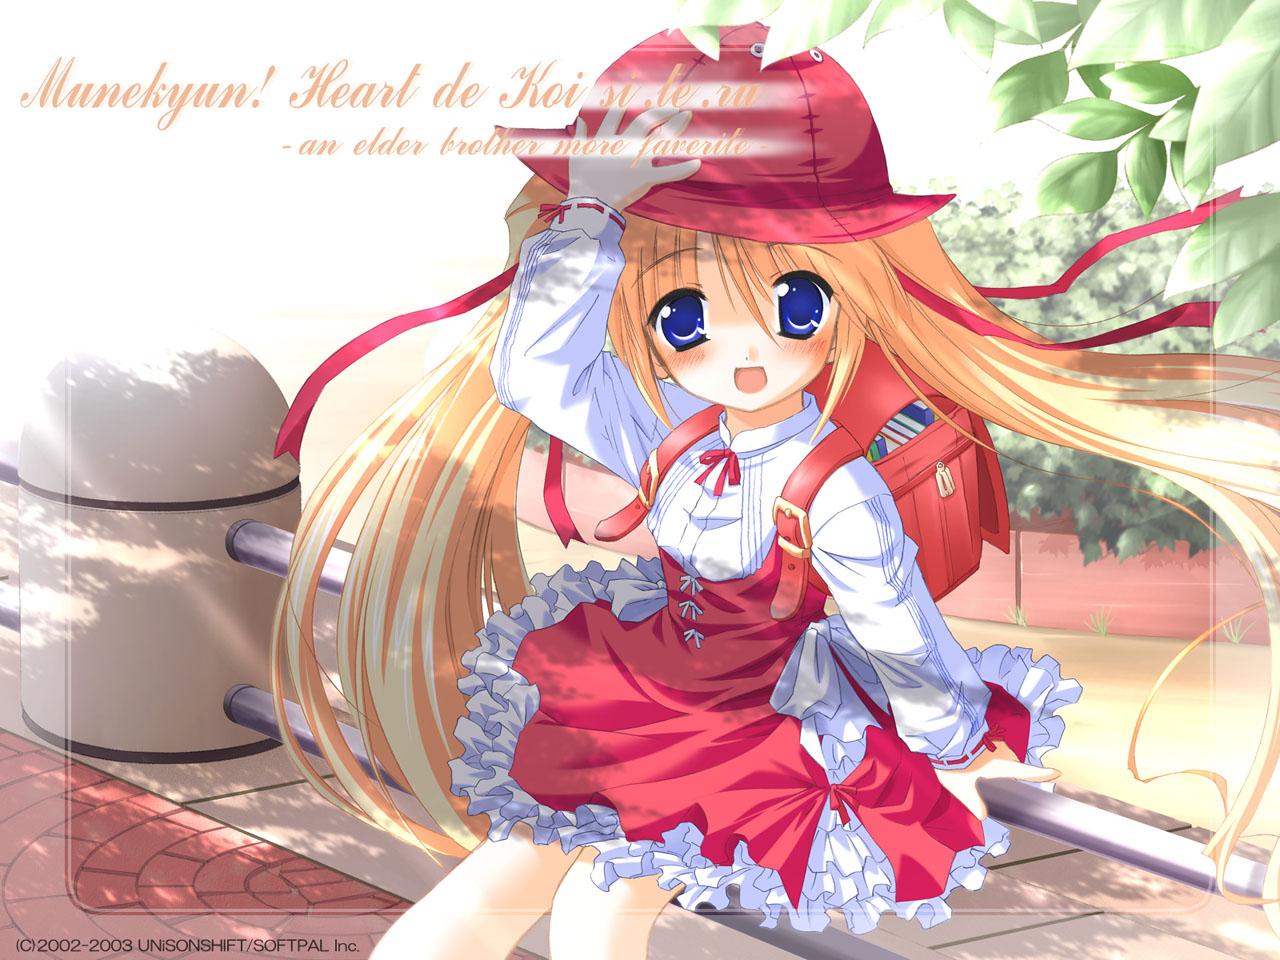 azuki_(munekyun_heart_de_koishiteru) blonde_hair blue_eyes blush hat loli munekyun_heart_de_koishiteru ribbons twintails